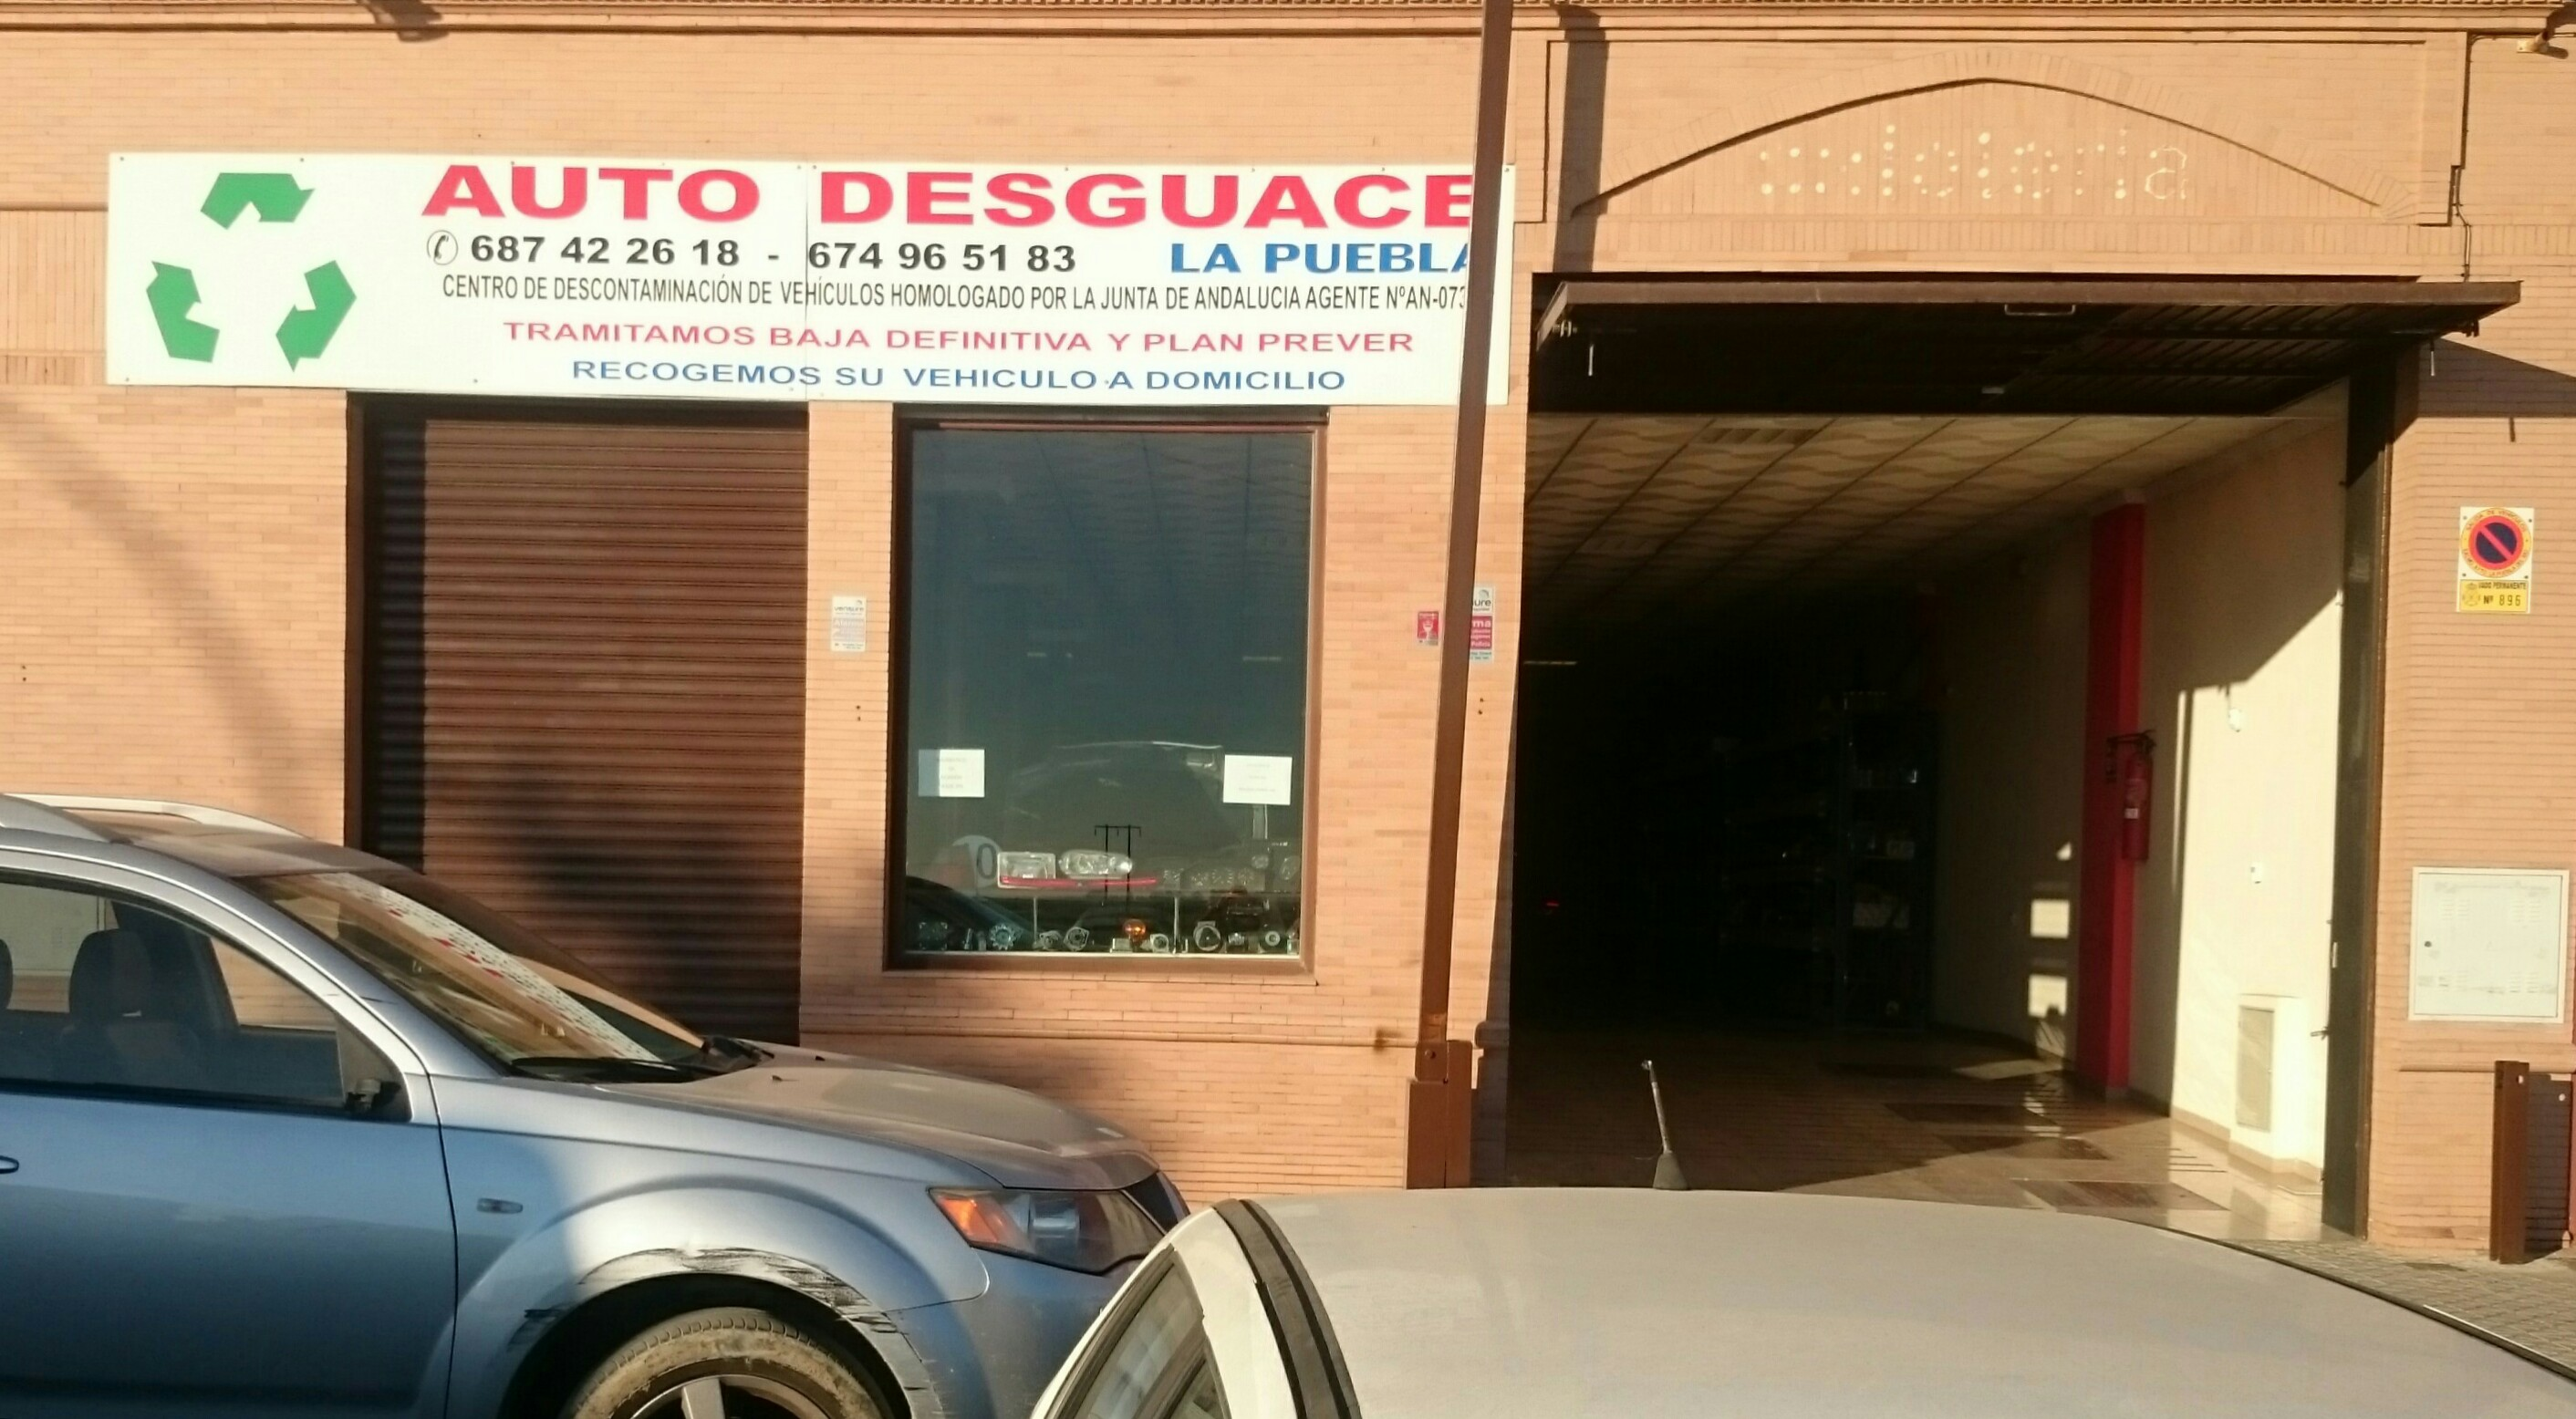 Auto Desguace La Puebla